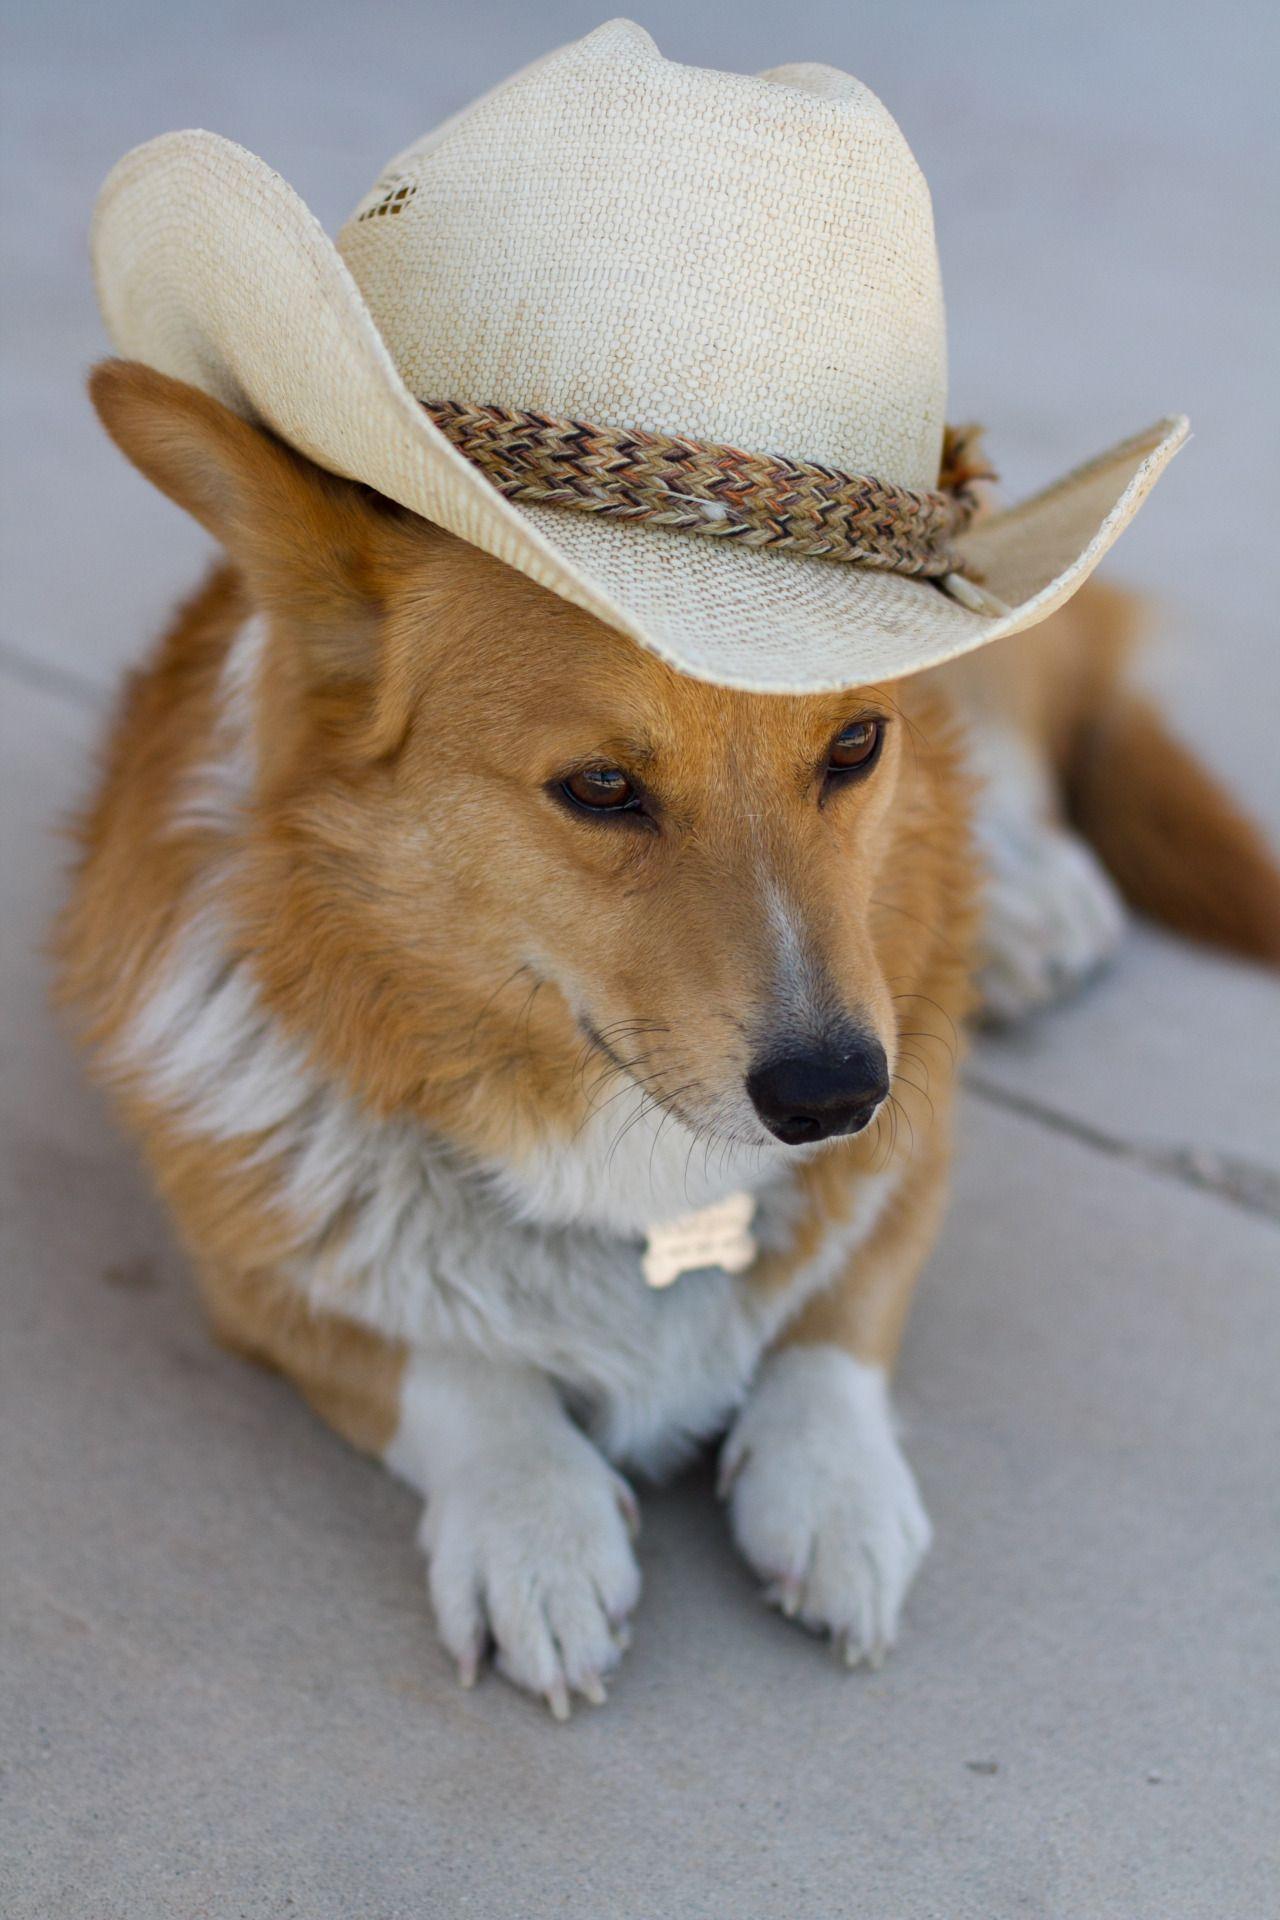 Cowboy Up Pembrokewelshcorginames Cowboy Corgi Corgi Corgi Dog